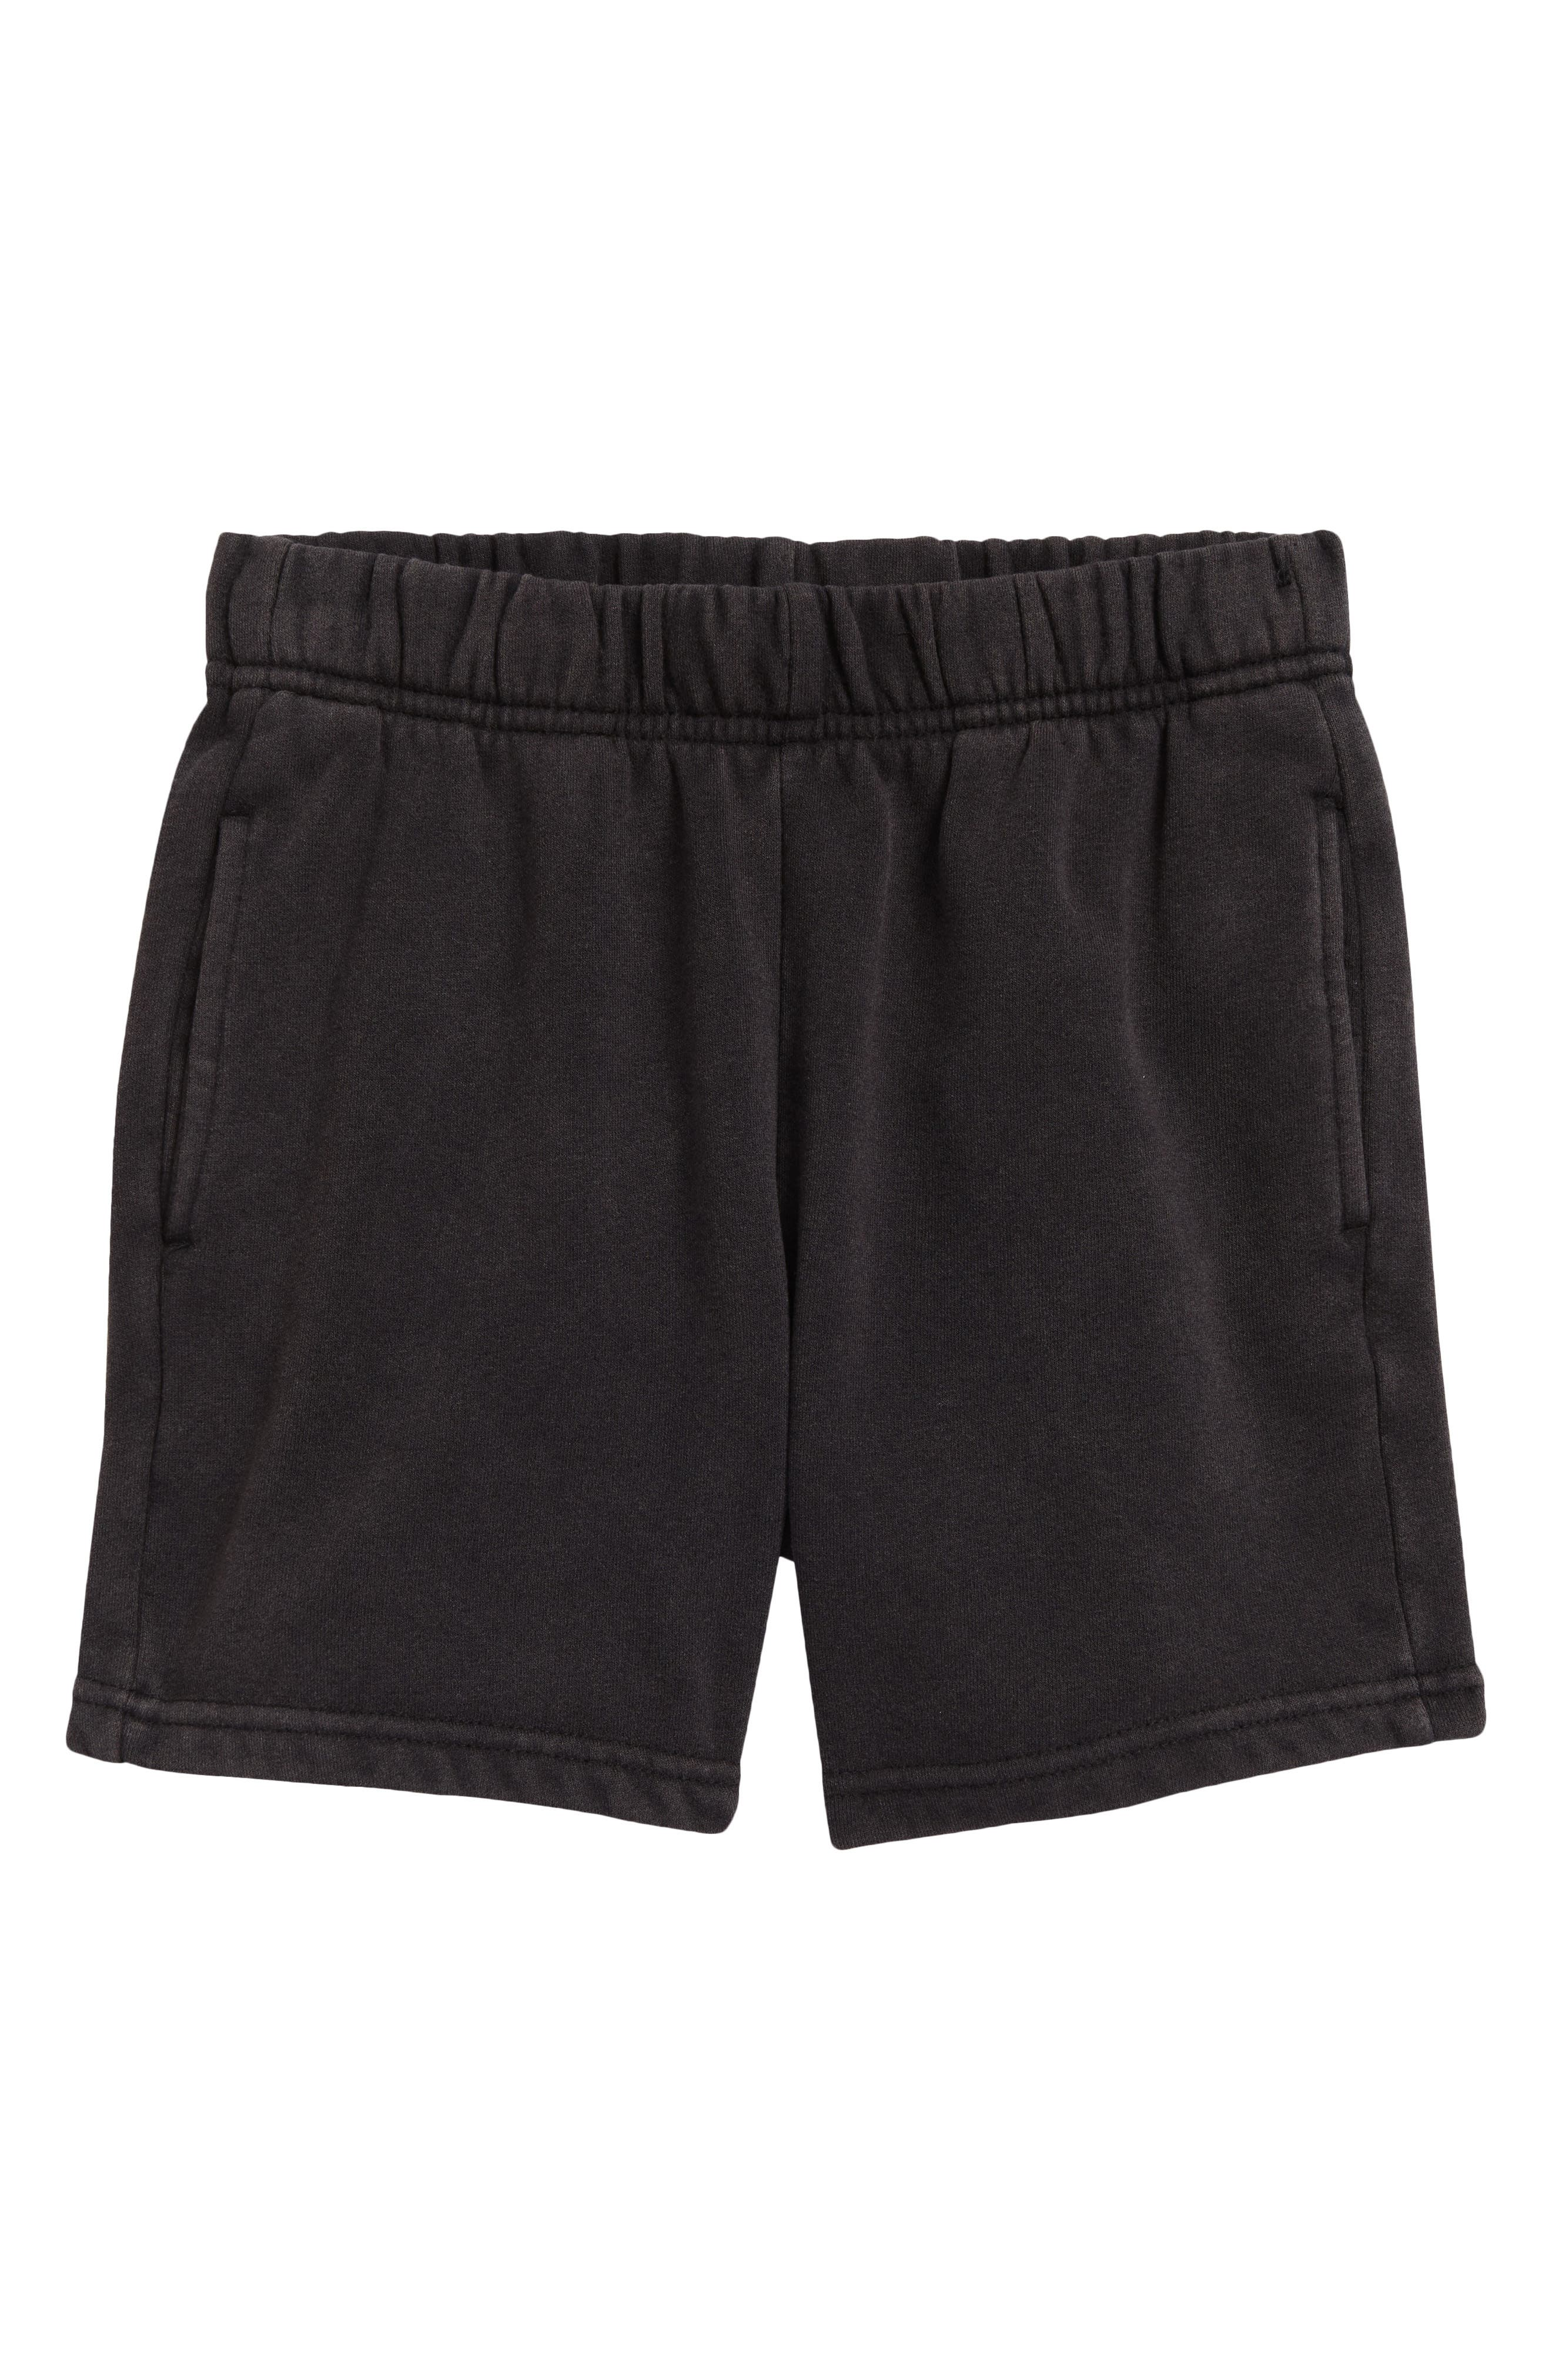 Colour Range Kids' Recycled Cotton Blend Fleece Shorts